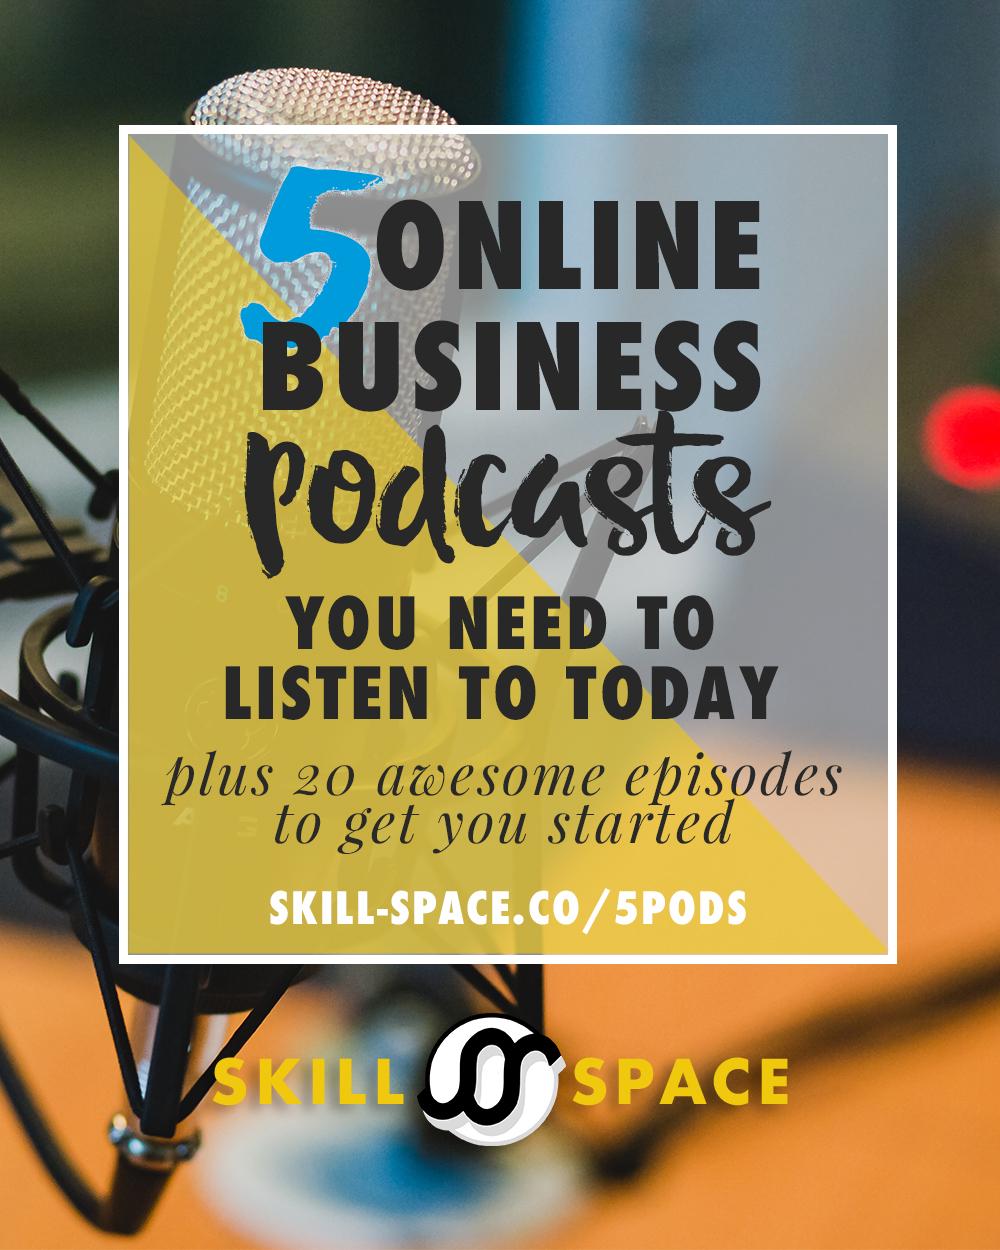 OnlineBiz-Podcasts5.jpg